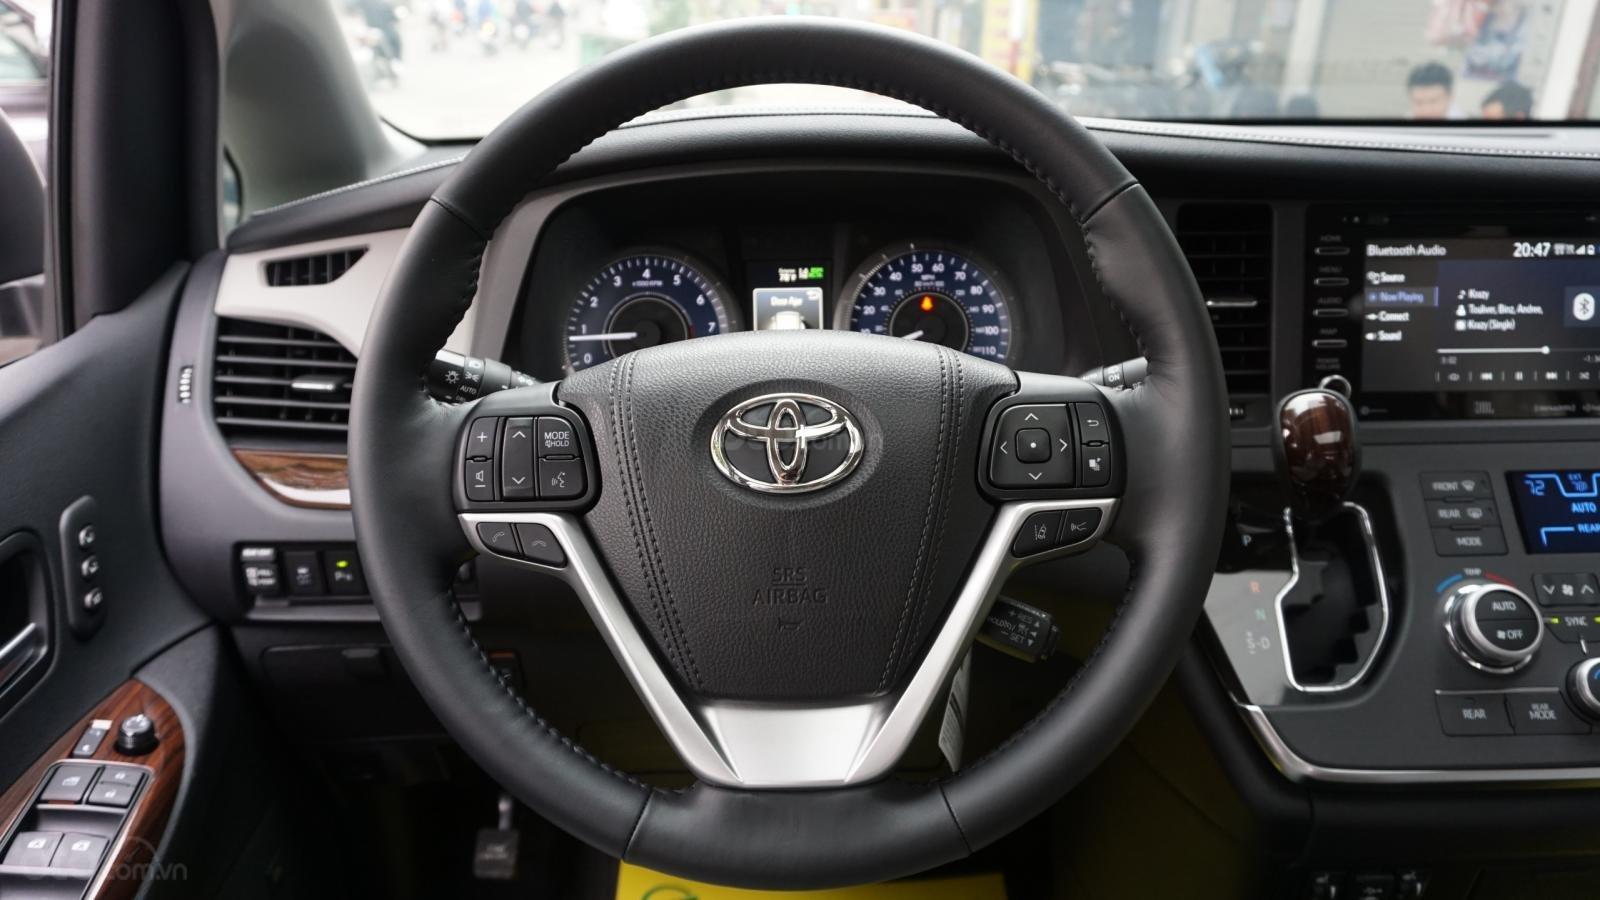 Bán xe Toyota Sienna Le Limited sản xuất 2018, nhập Mỹ - LH 0945392468-14